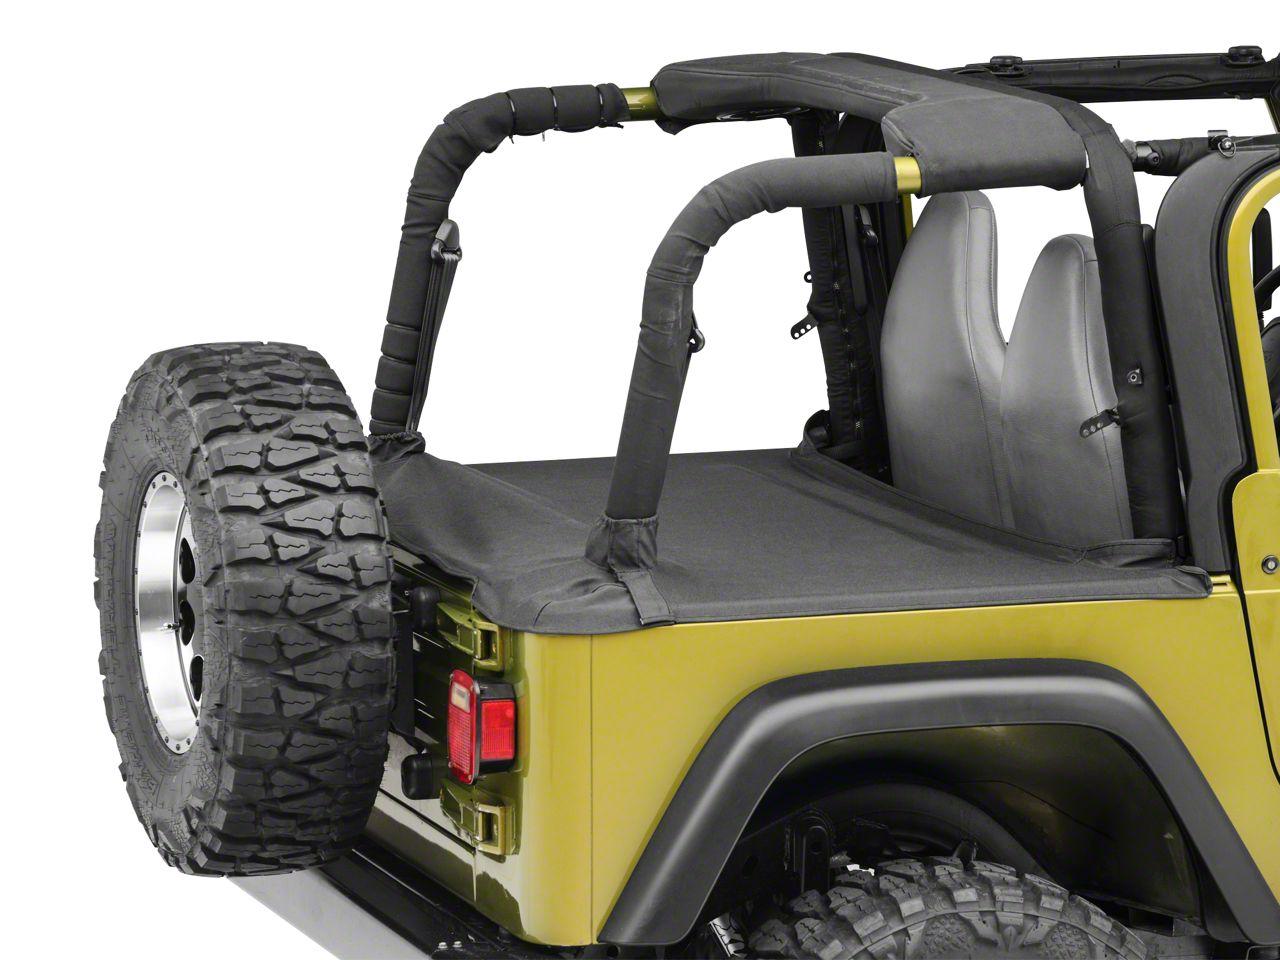 Smittybilt Tonneau Cover - Black Denim (97-06 Jeep Wrangler TJ, Excluding Unlimited)